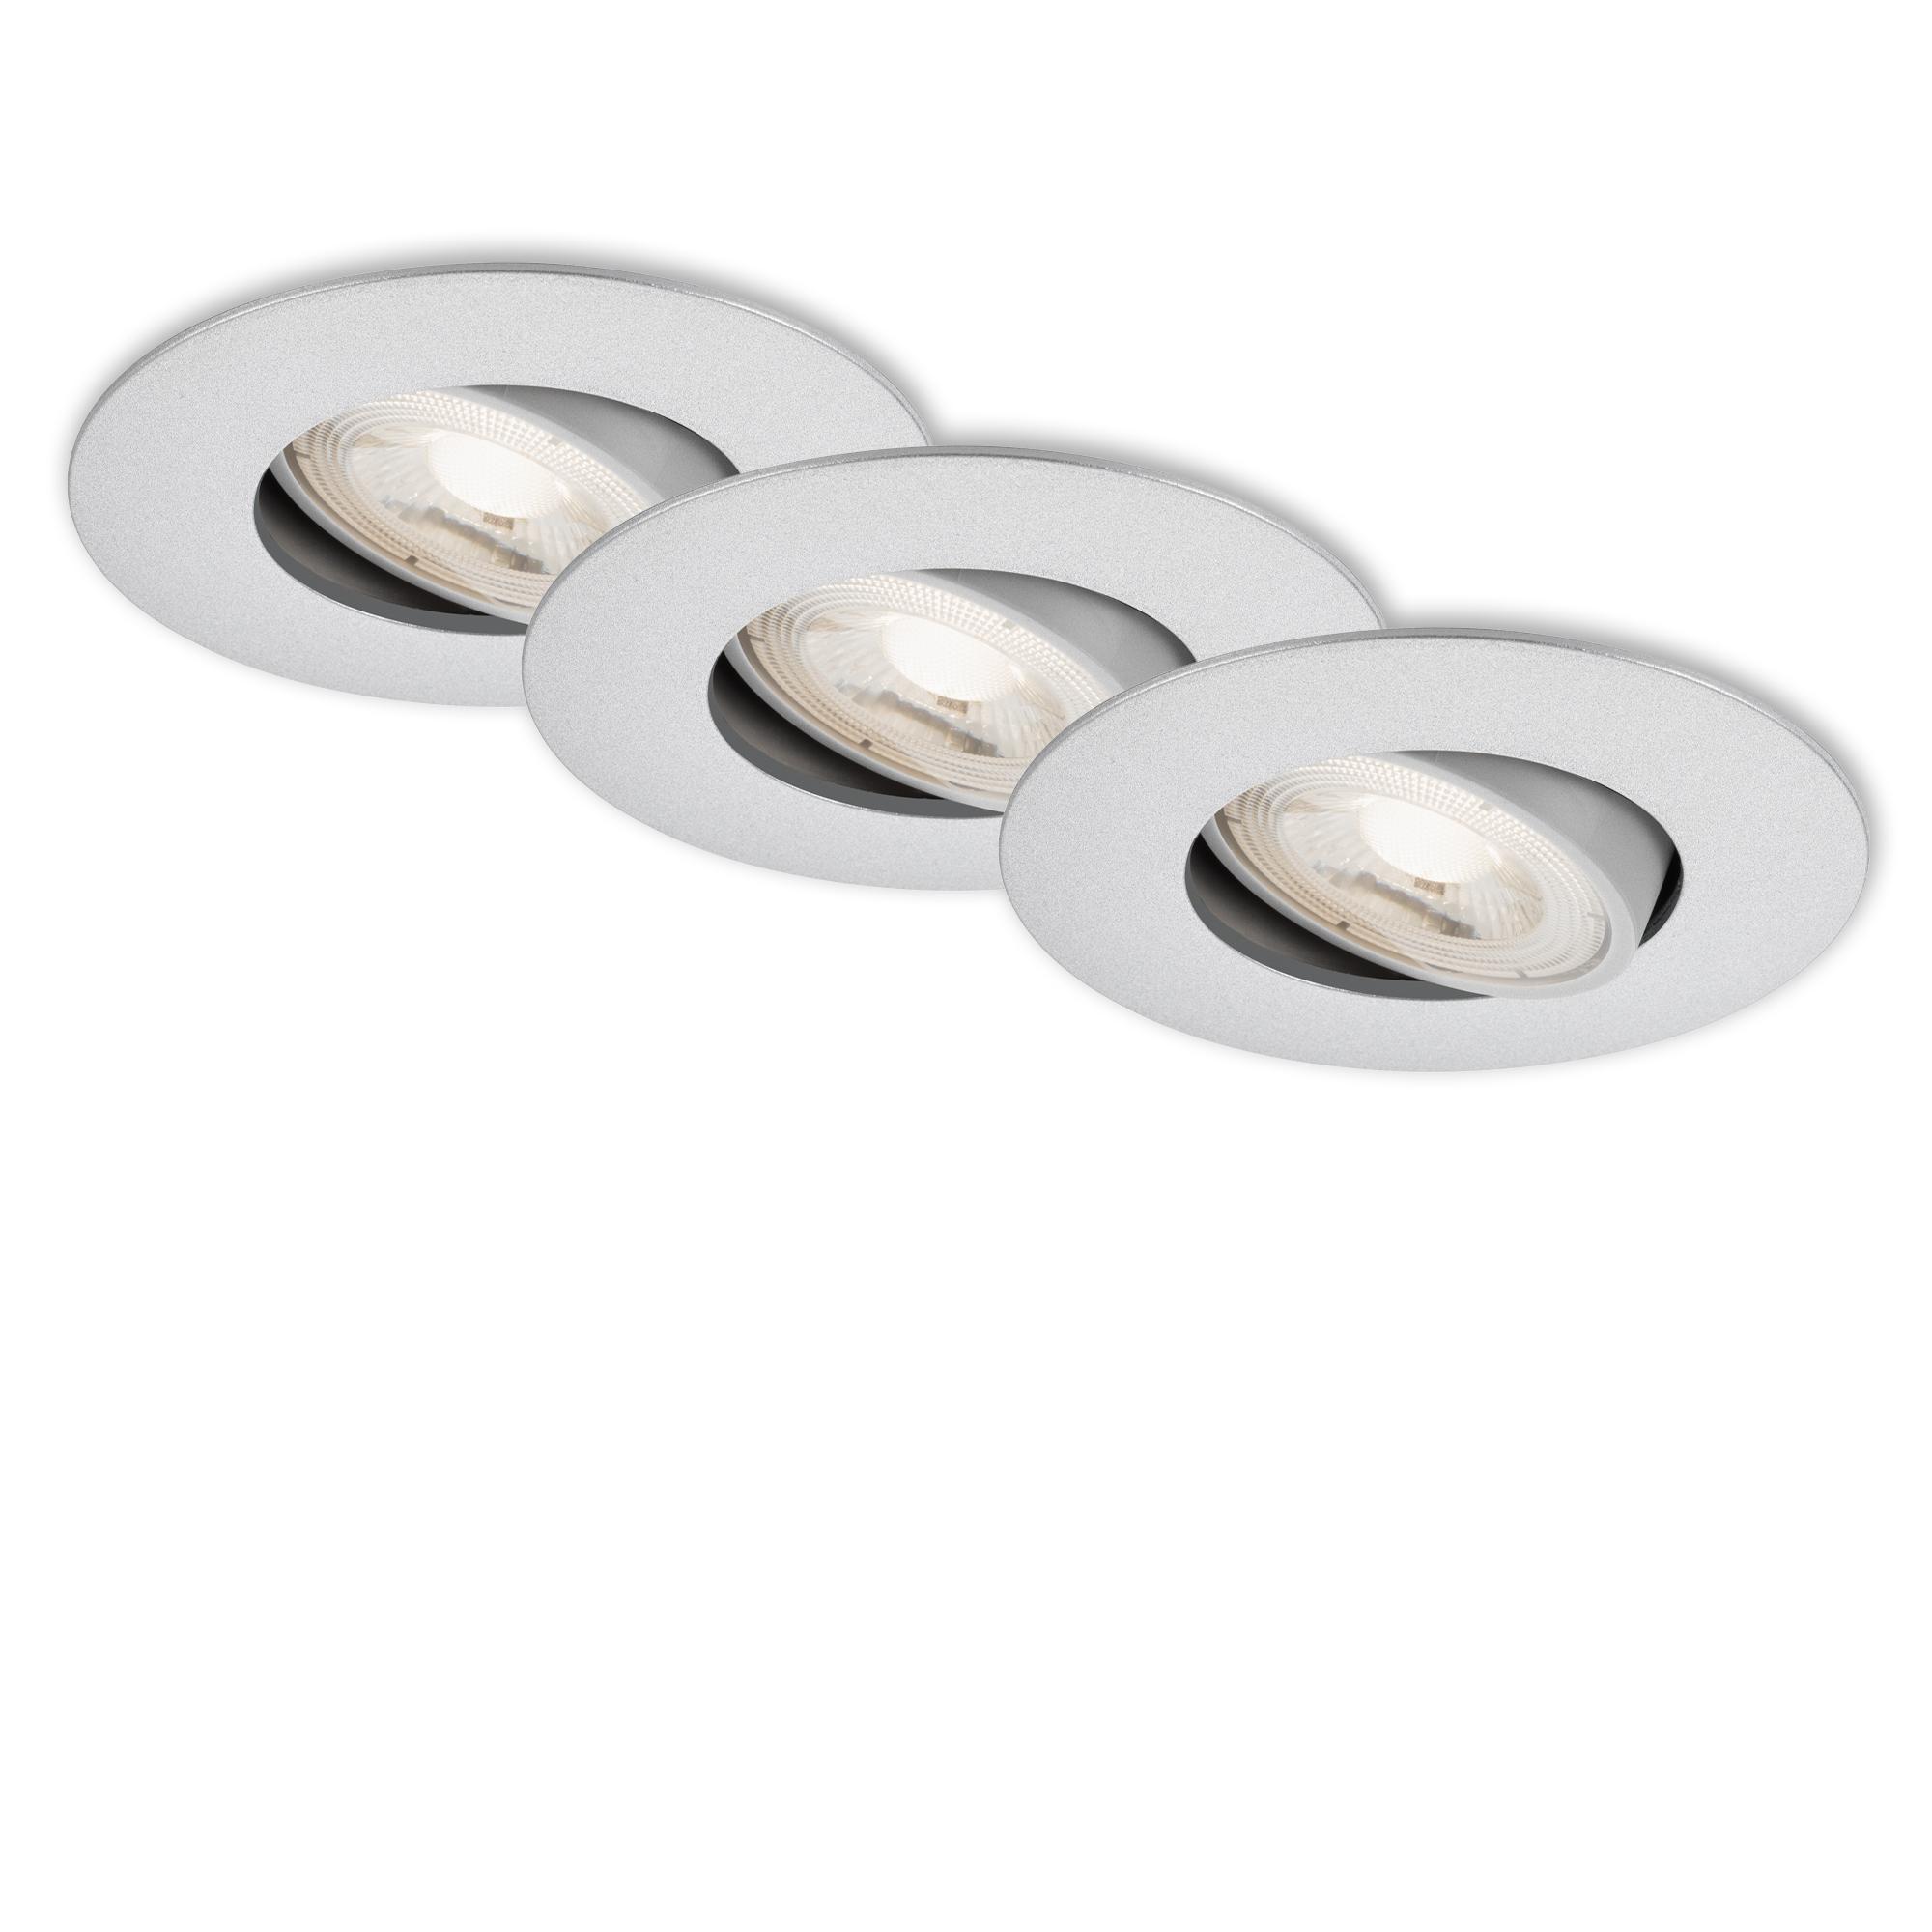 3er Set Ultraflache LED Einbauleuchte, Ø 9 cm, 5 W, Chrom-Matt